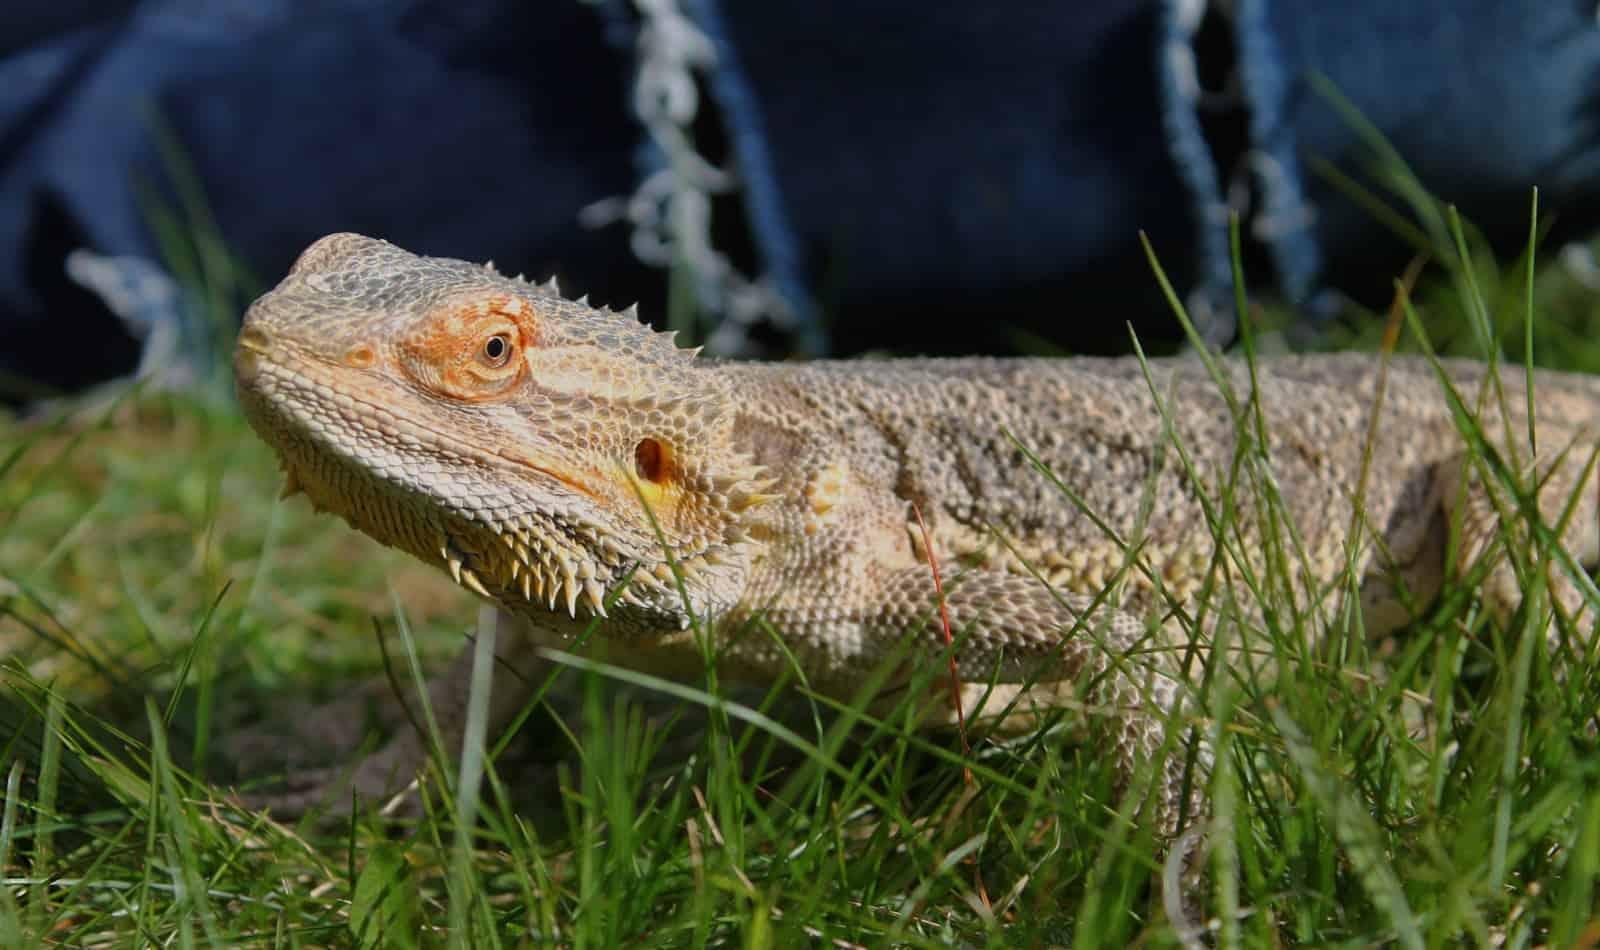 bearded dragon walking on the grass